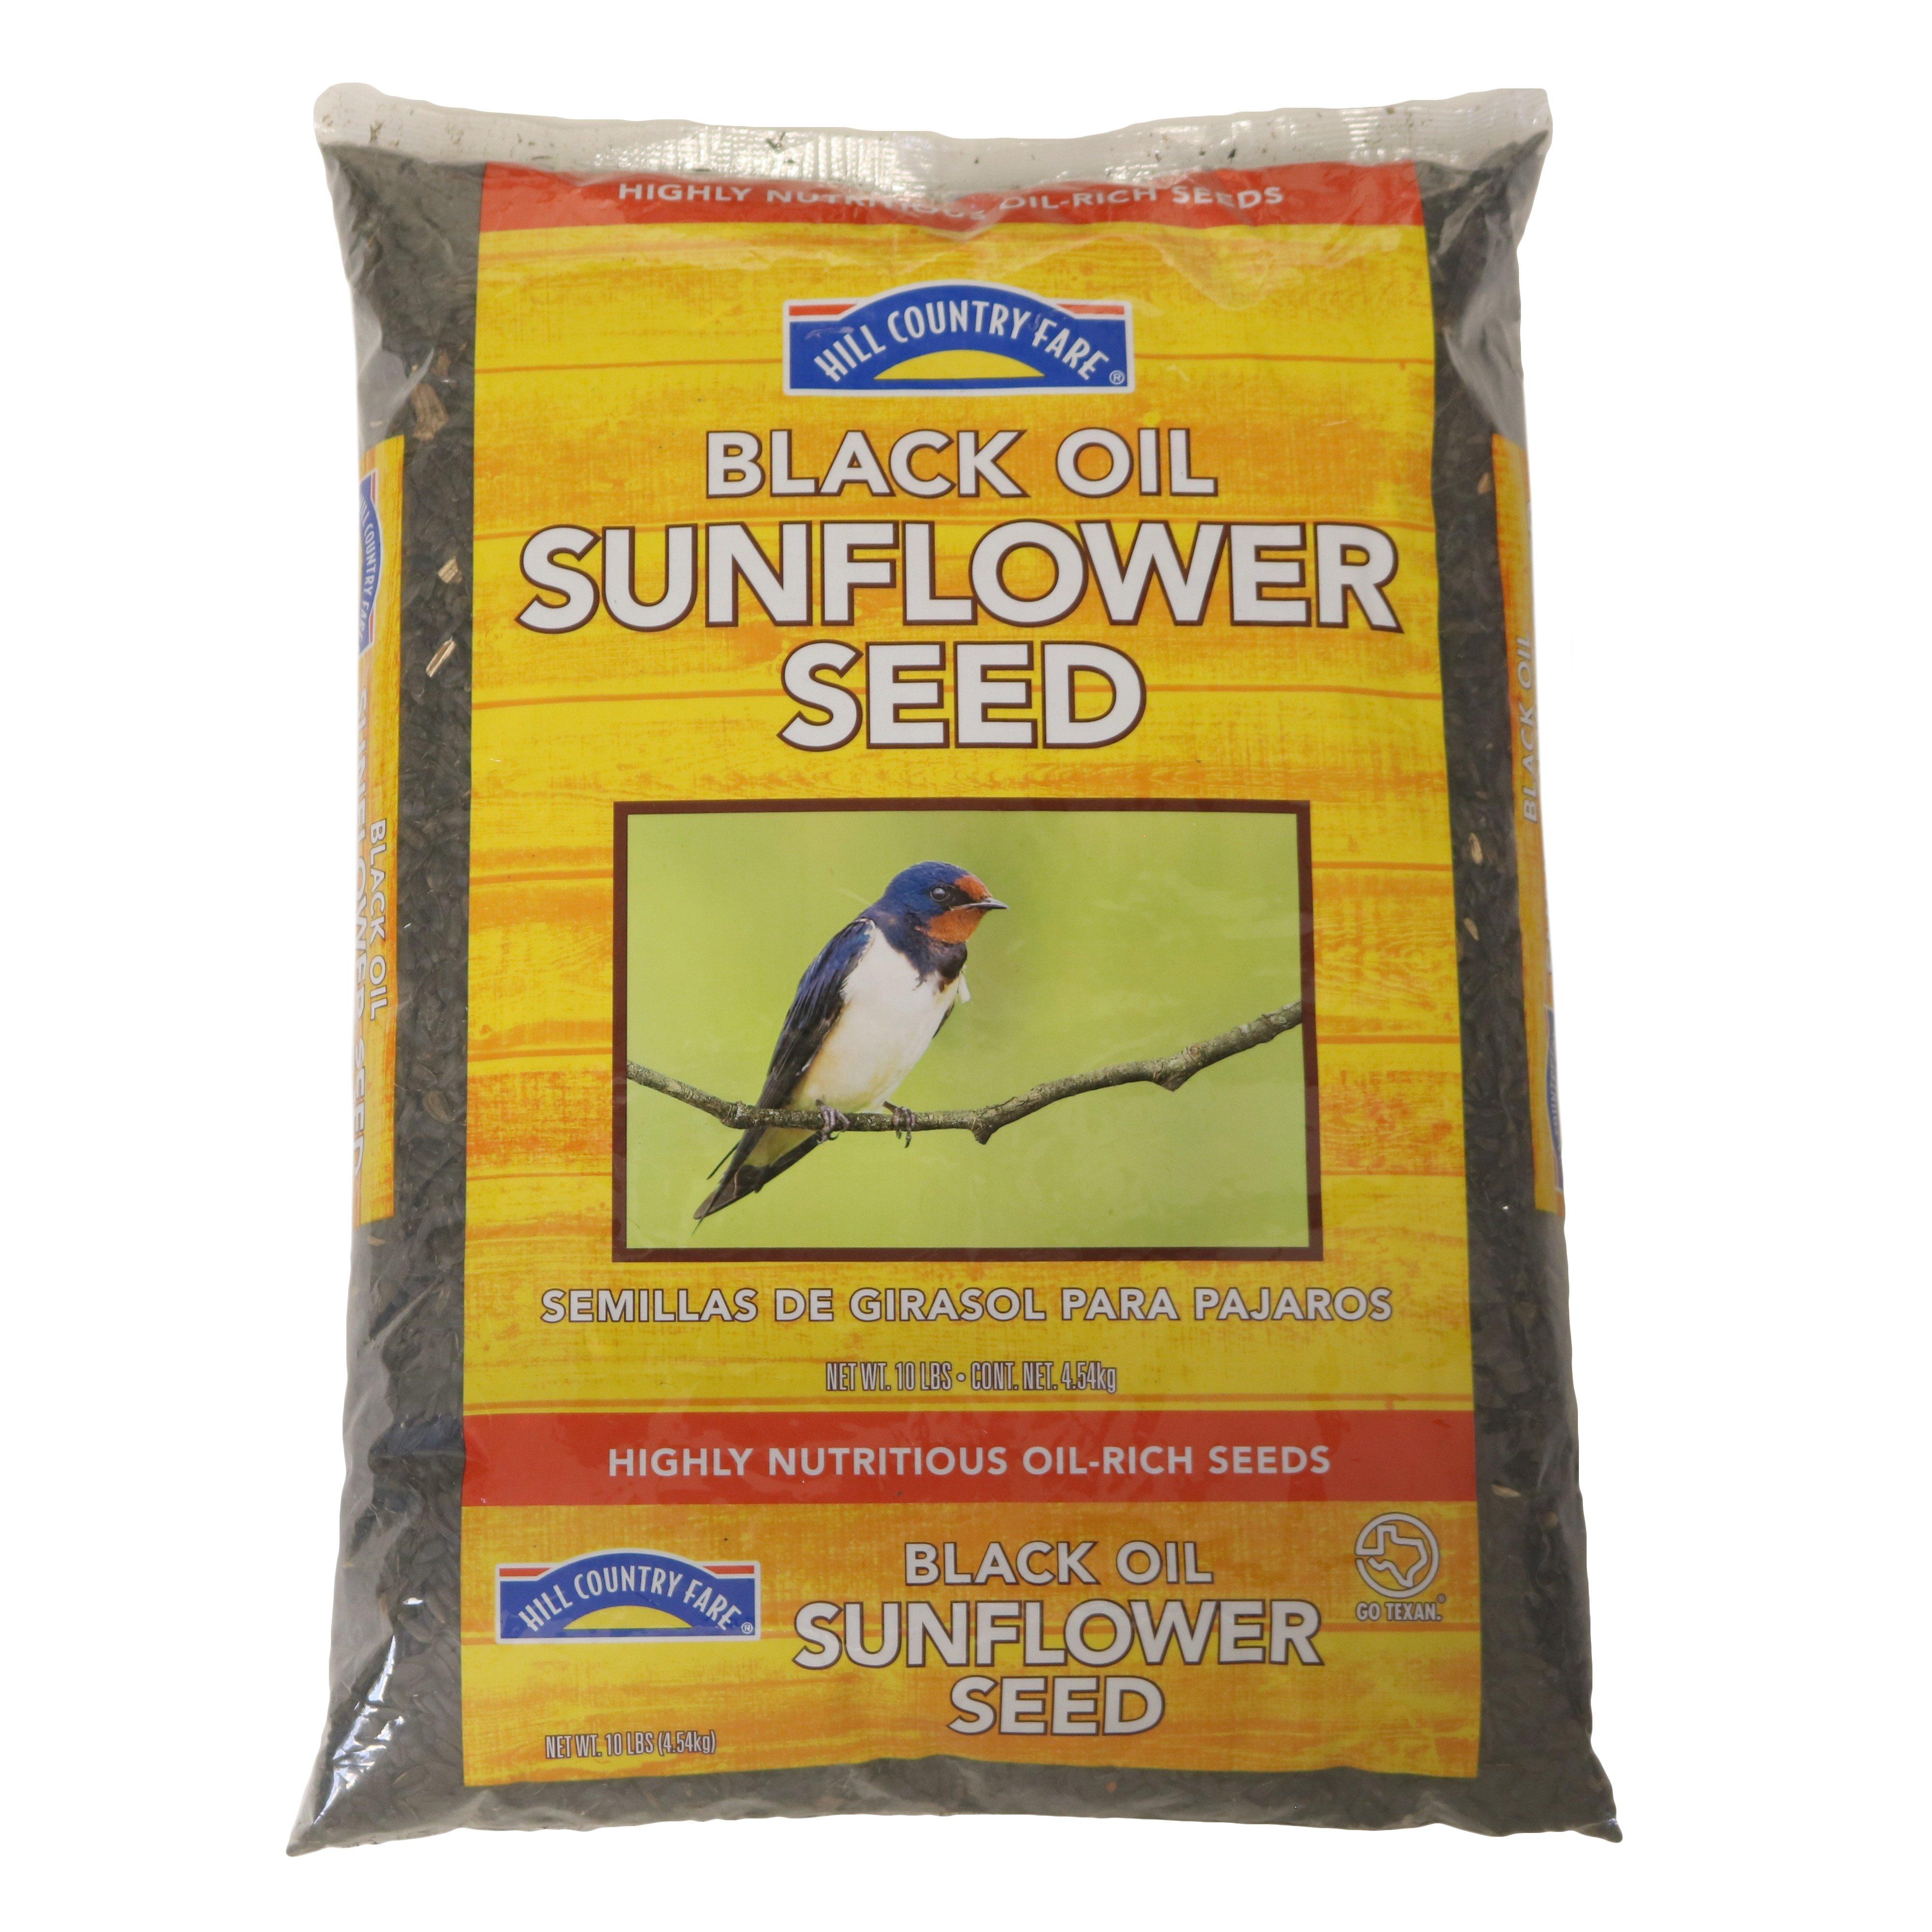 Hill Country Fare Black Oil Sunflower